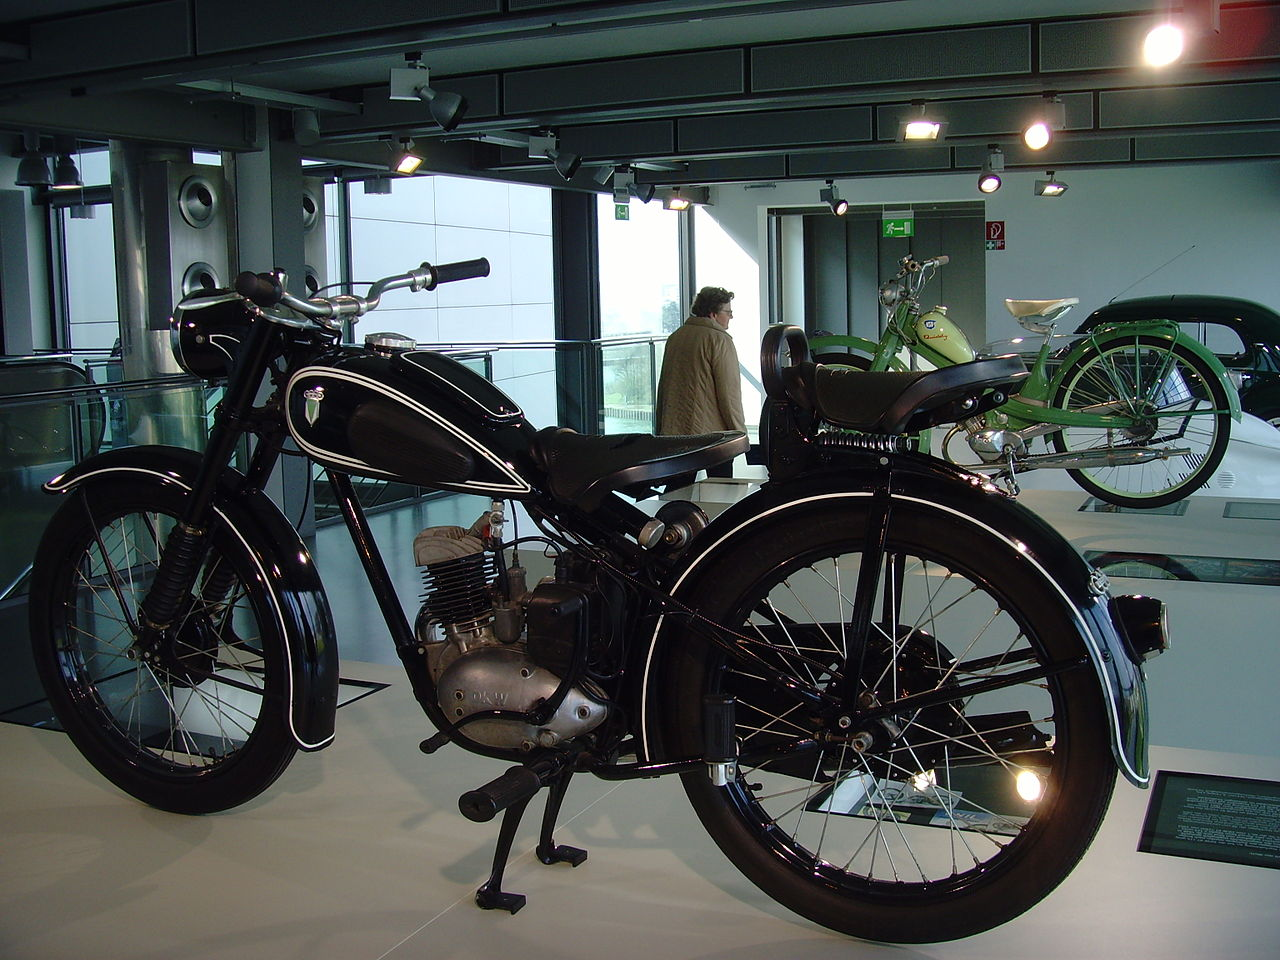 file autostadt wolfsburg motorrad ikonen dkw rt 125. Black Bedroom Furniture Sets. Home Design Ideas